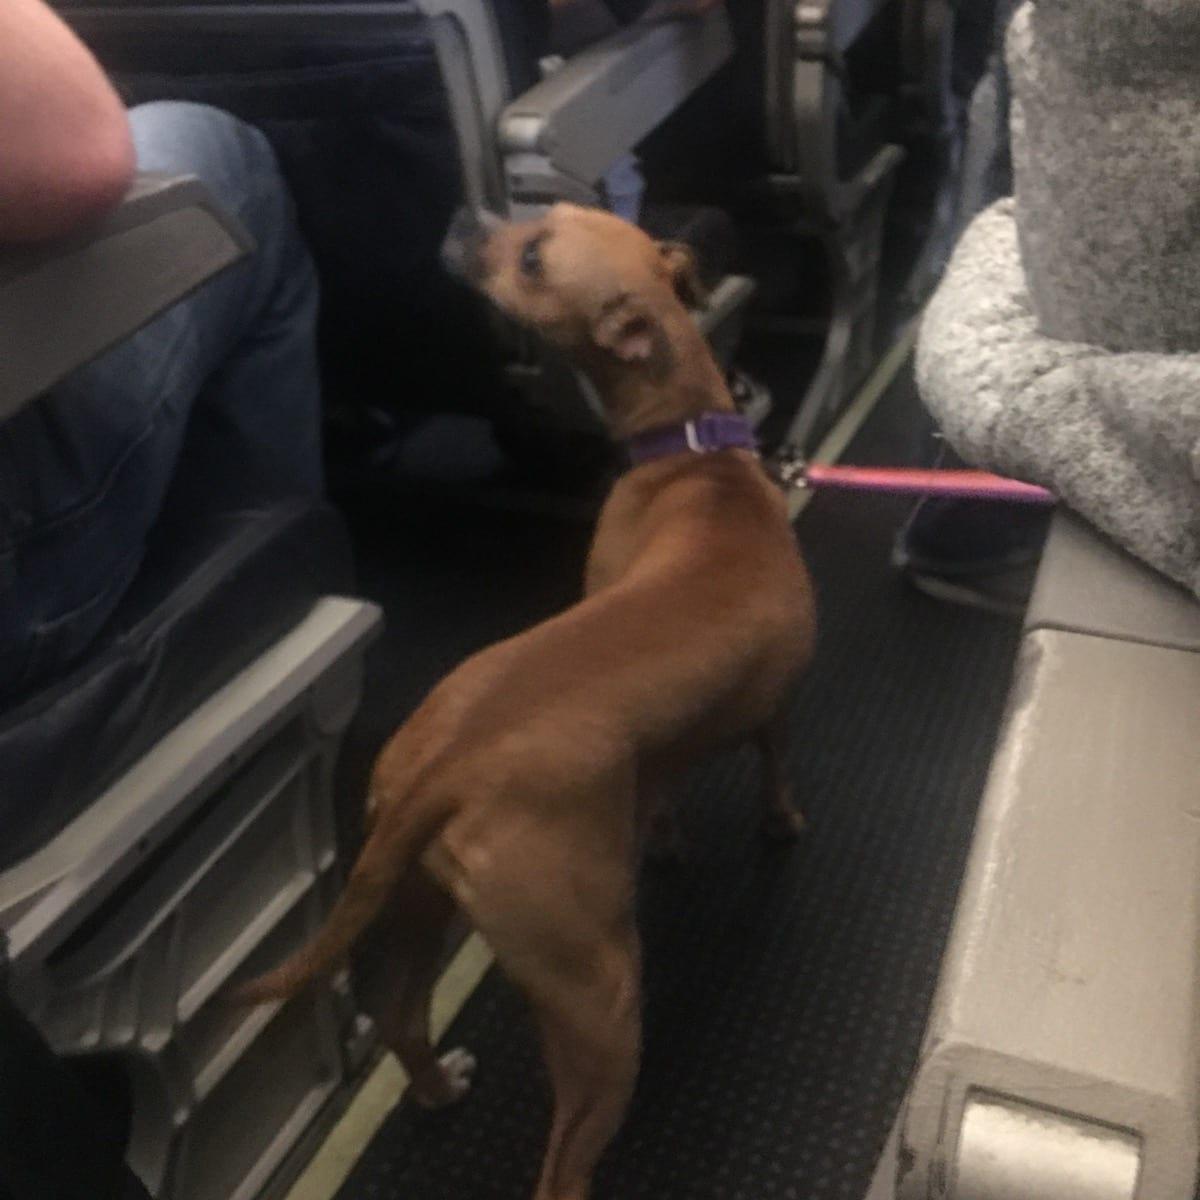 a dog on a plane